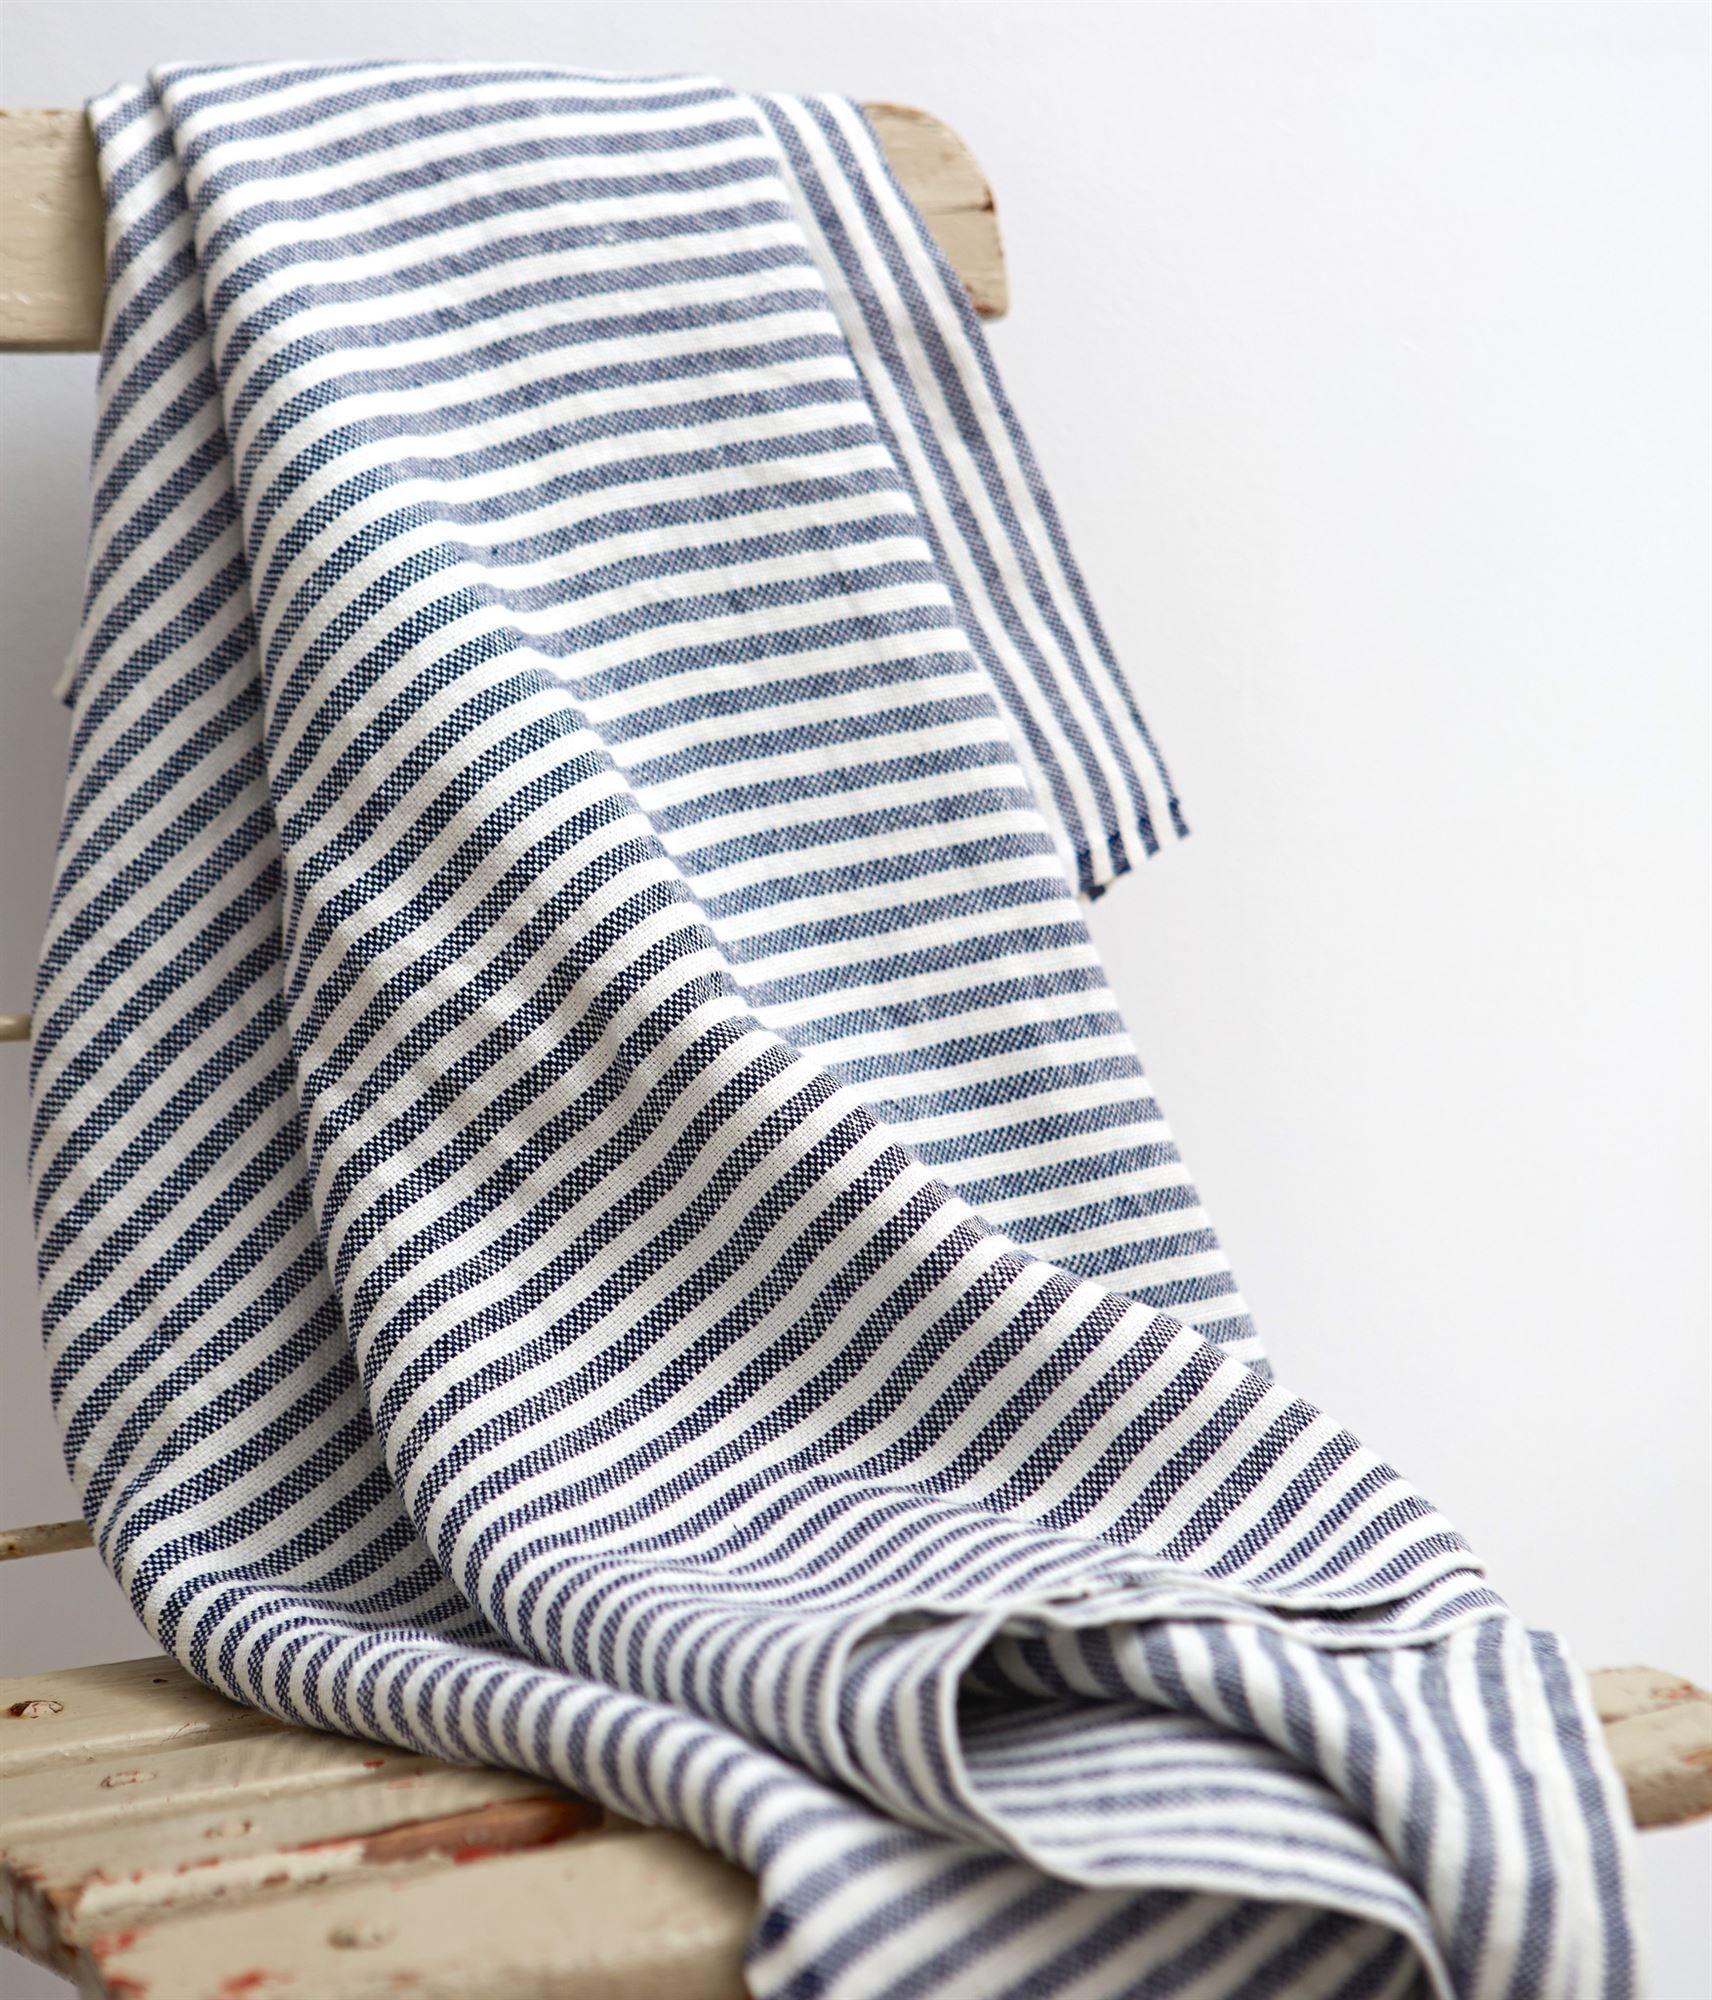 Fog linen at elsie green chambray linen blanket cushion throw